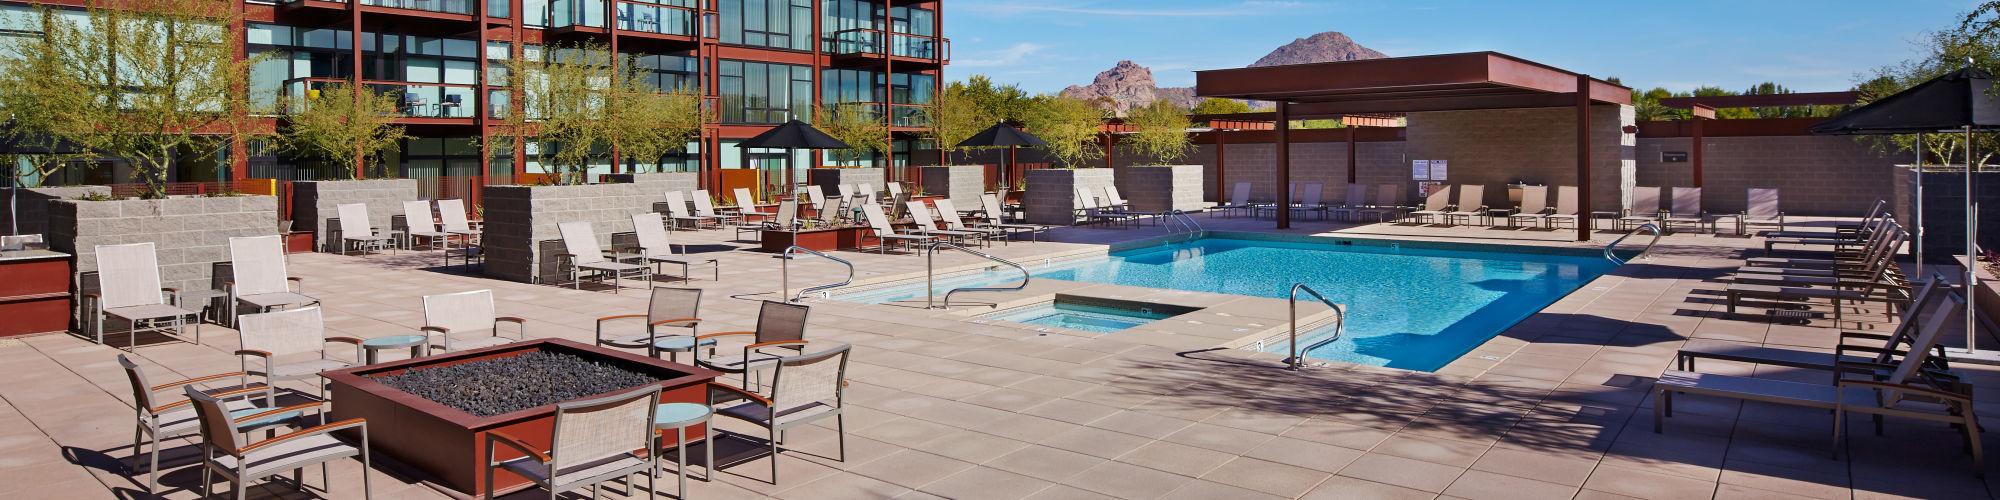 Contact us at Domus in Phoenix, Arizona